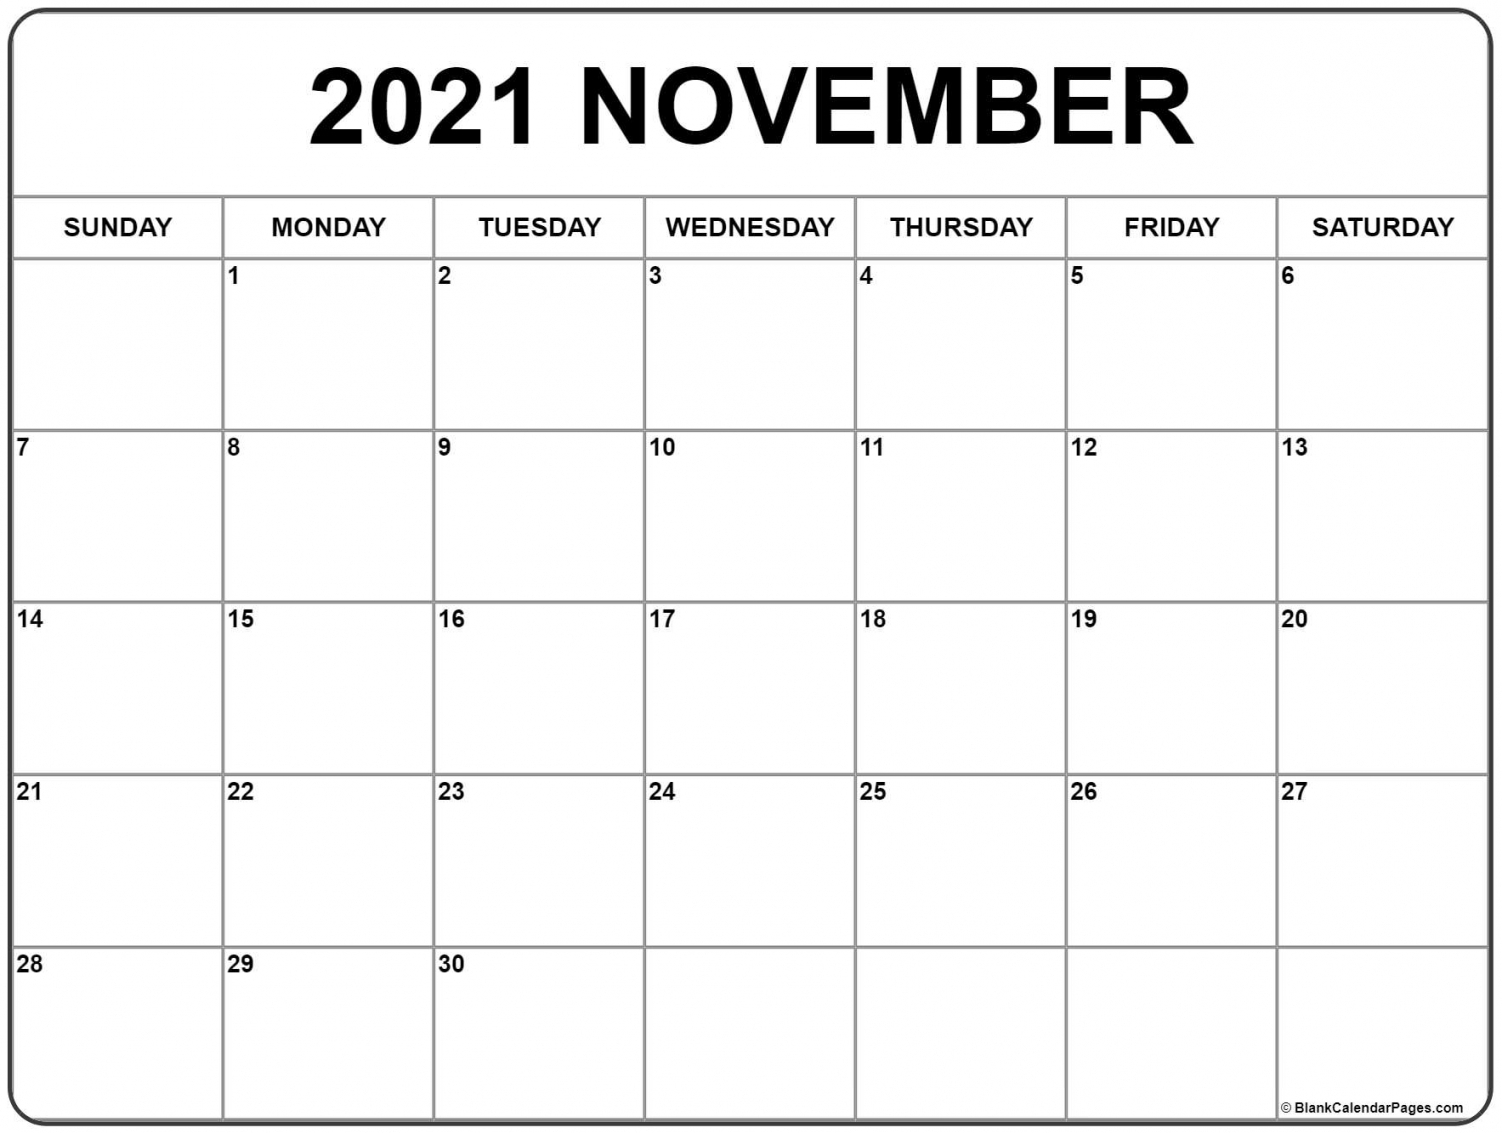 Printable November 2021 Calendar | Free Letter Templates